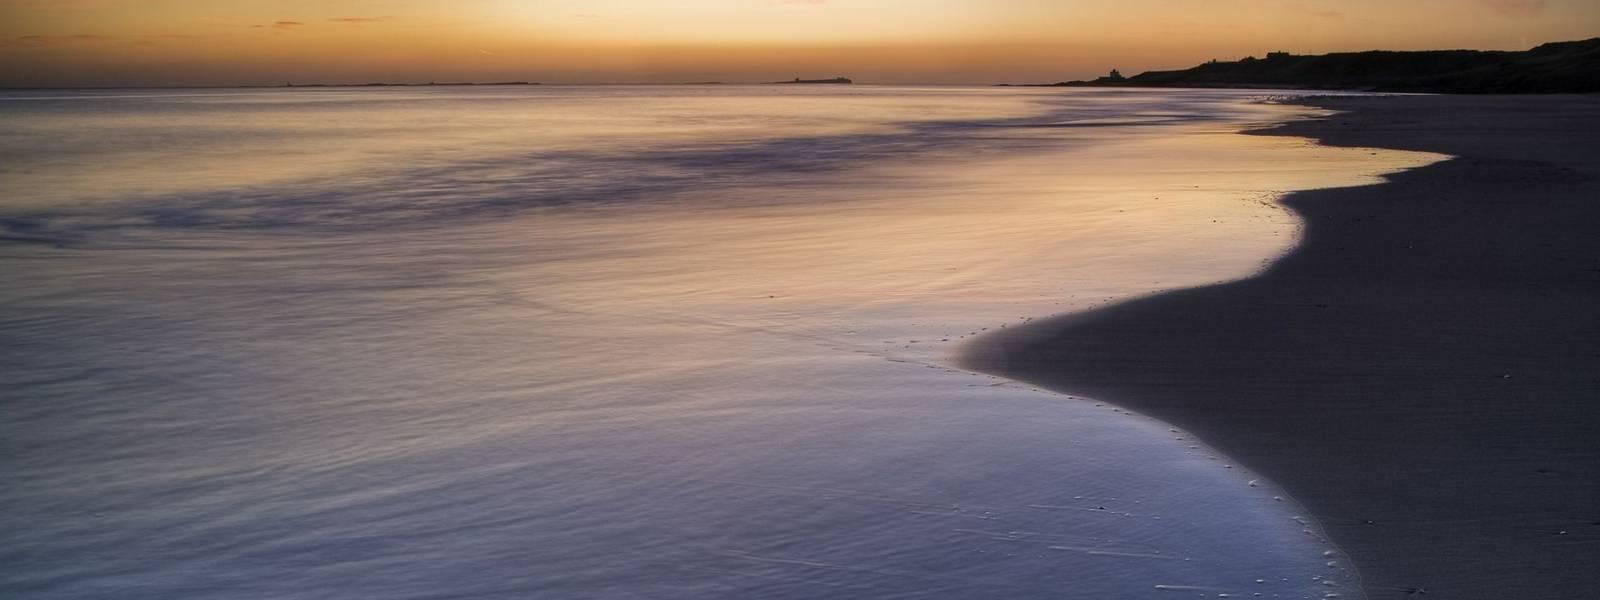 Pink pre-dawn light illuminates the sea at Budle Bay, Northumberland